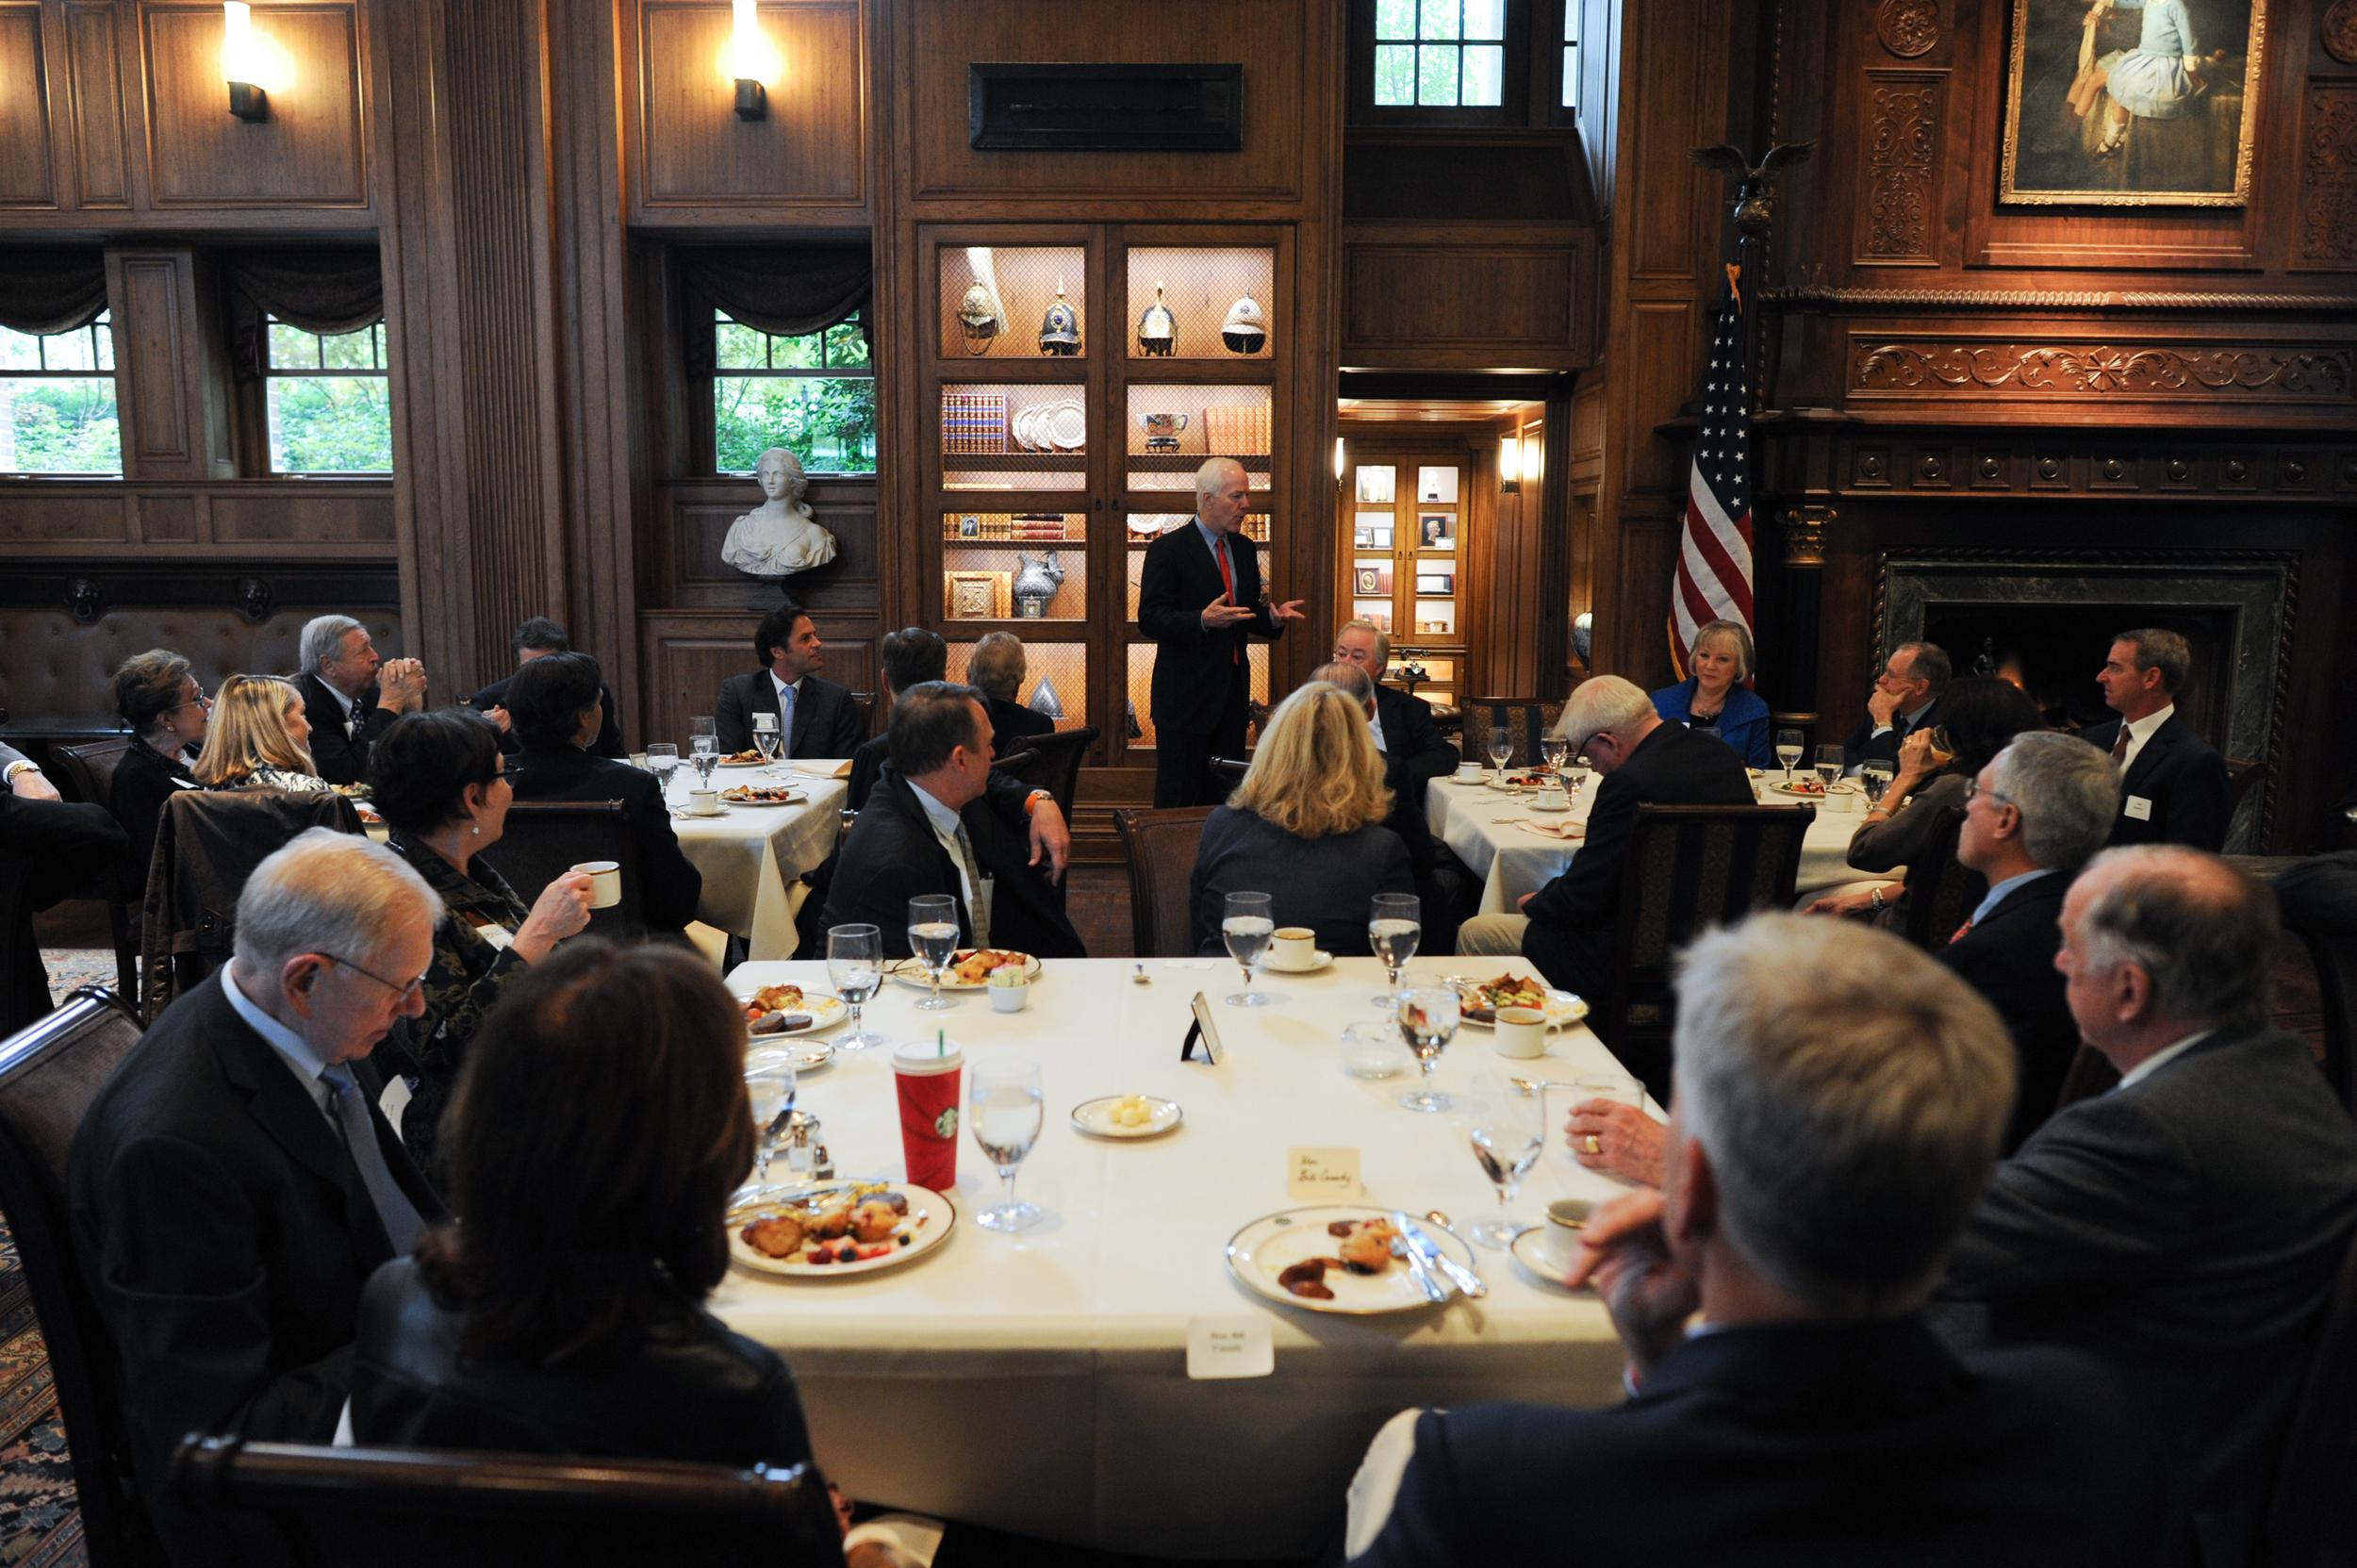 Senator John Cornyn speaks at the Senate Battleground Fund Breakfast in 2014.